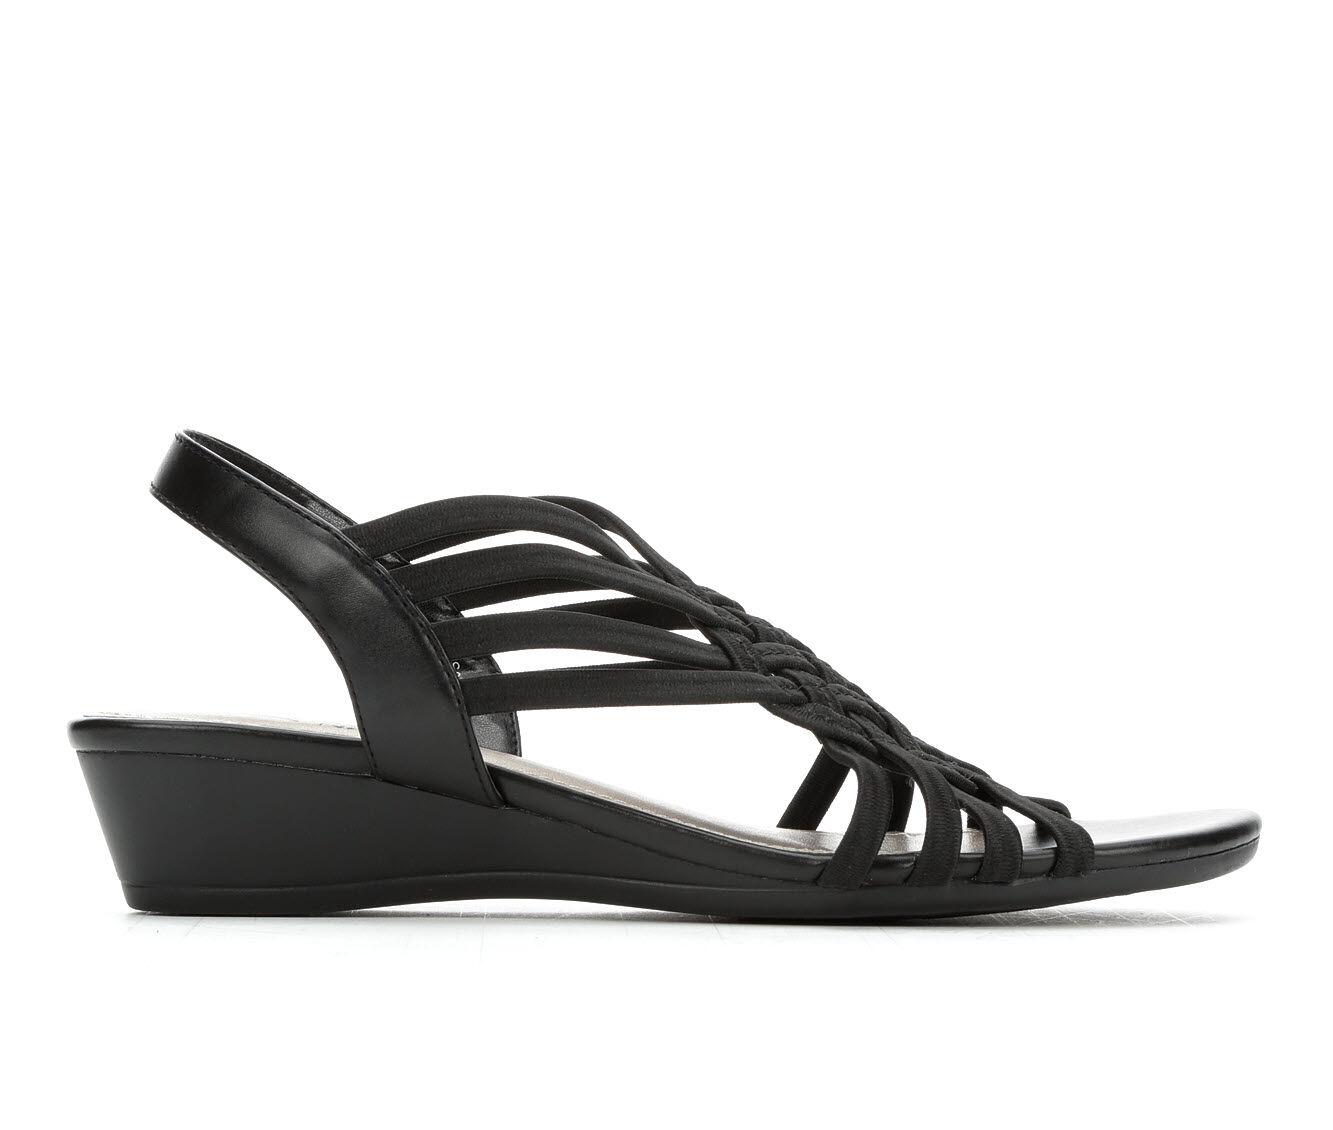 Fashionable Style Women's Impo Rosia Strappy Sandals Black